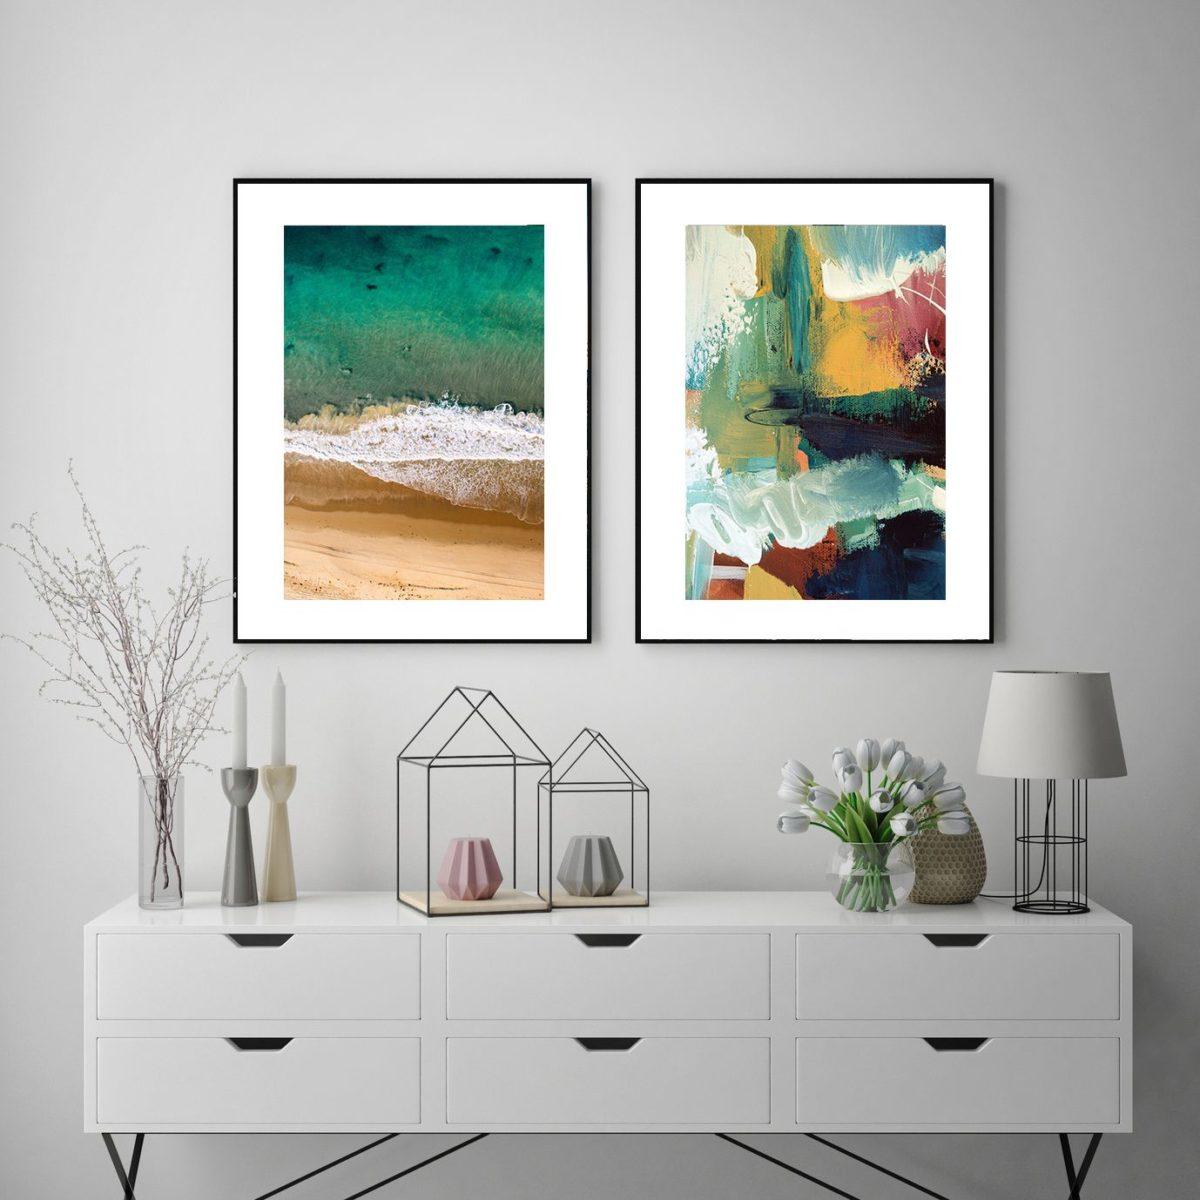 4abstract-house_abstract-reality-abstracthouse.com-modern-art-print-set-of-2-poster-modern-decor-wall-art-print-living-room-1200x1200.jpg